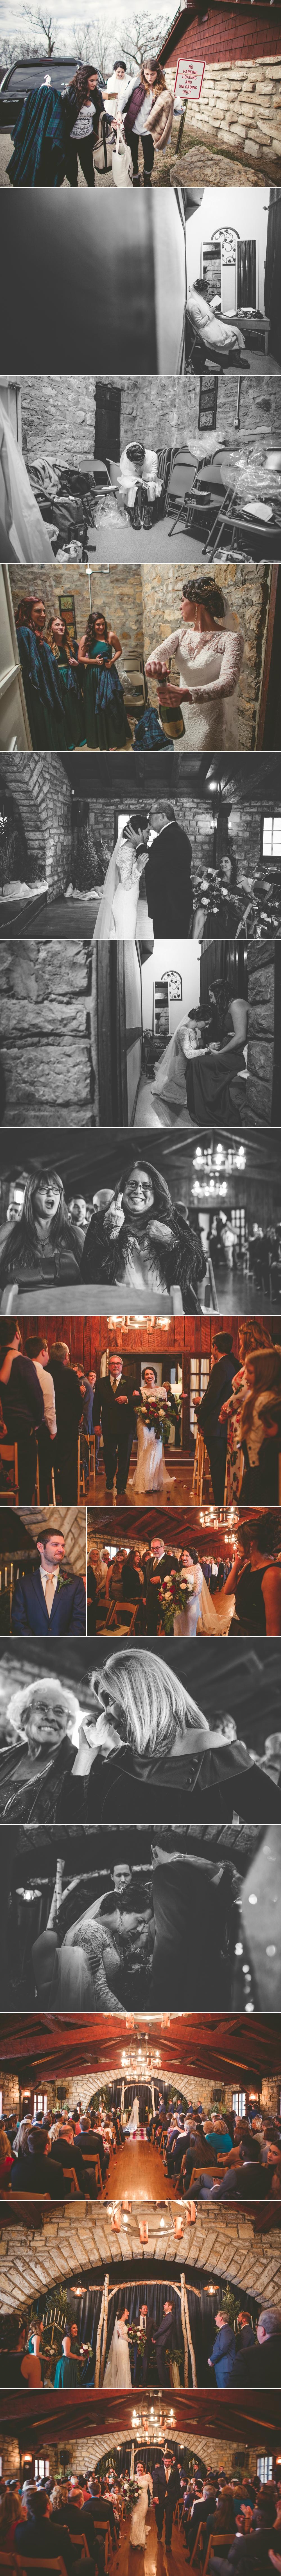 jason_domingues_photography_best_kansas_city_photographer_wedding_kc_weddings_james_p_davis_hall_0003.jpg